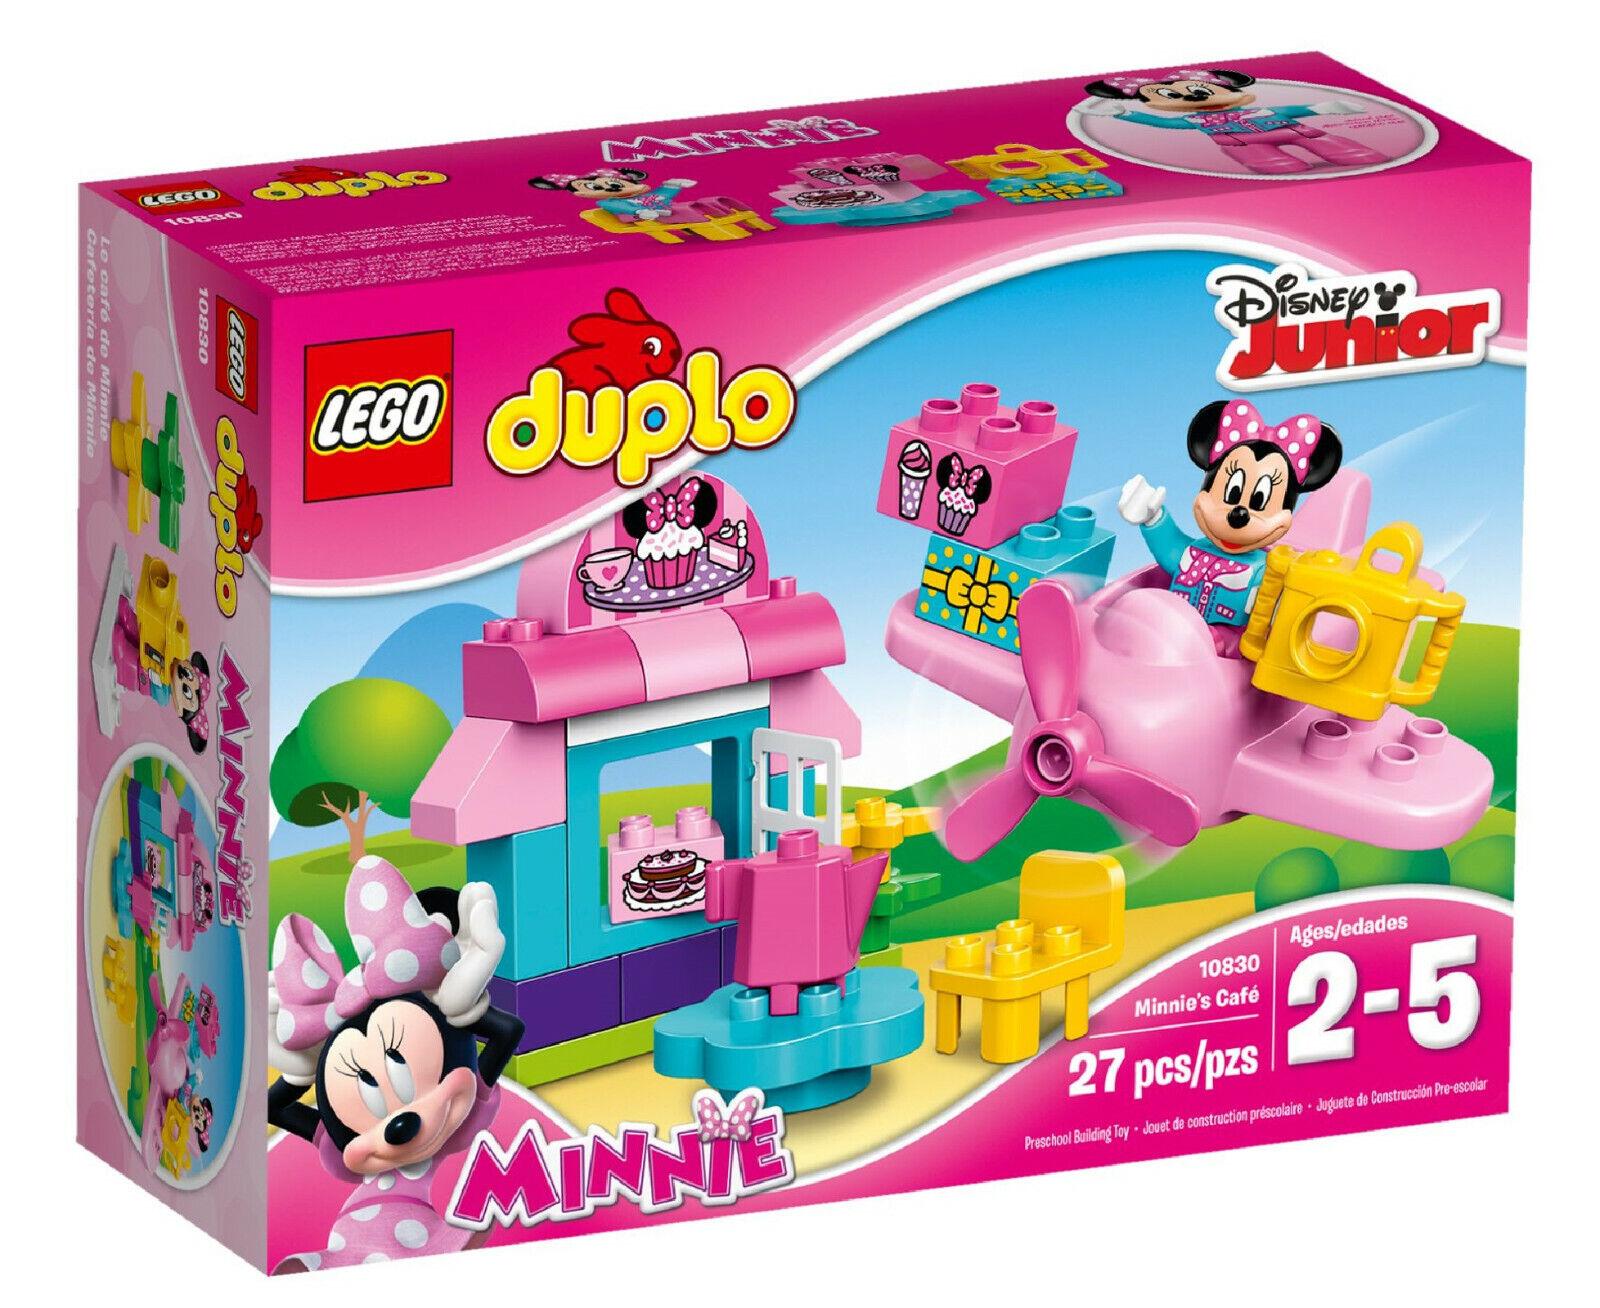 LEGO® Duplo® (10830) Minnies Café inkl Versand NEU&OVP